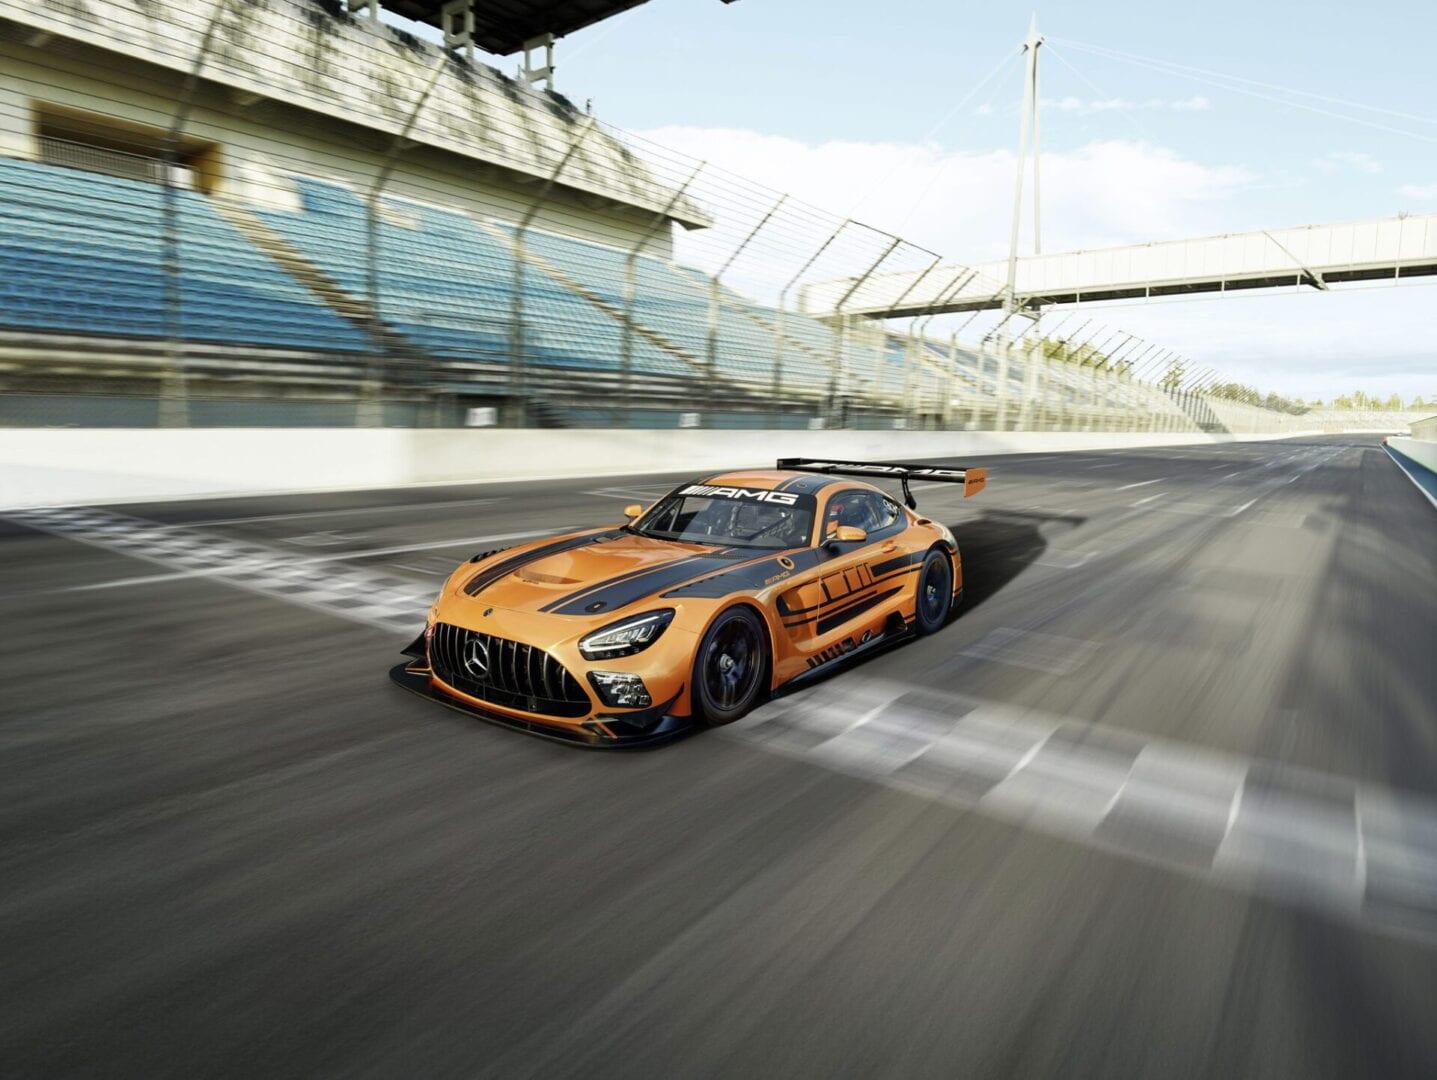 10 Years of Mercedes-AMG Customer Racing